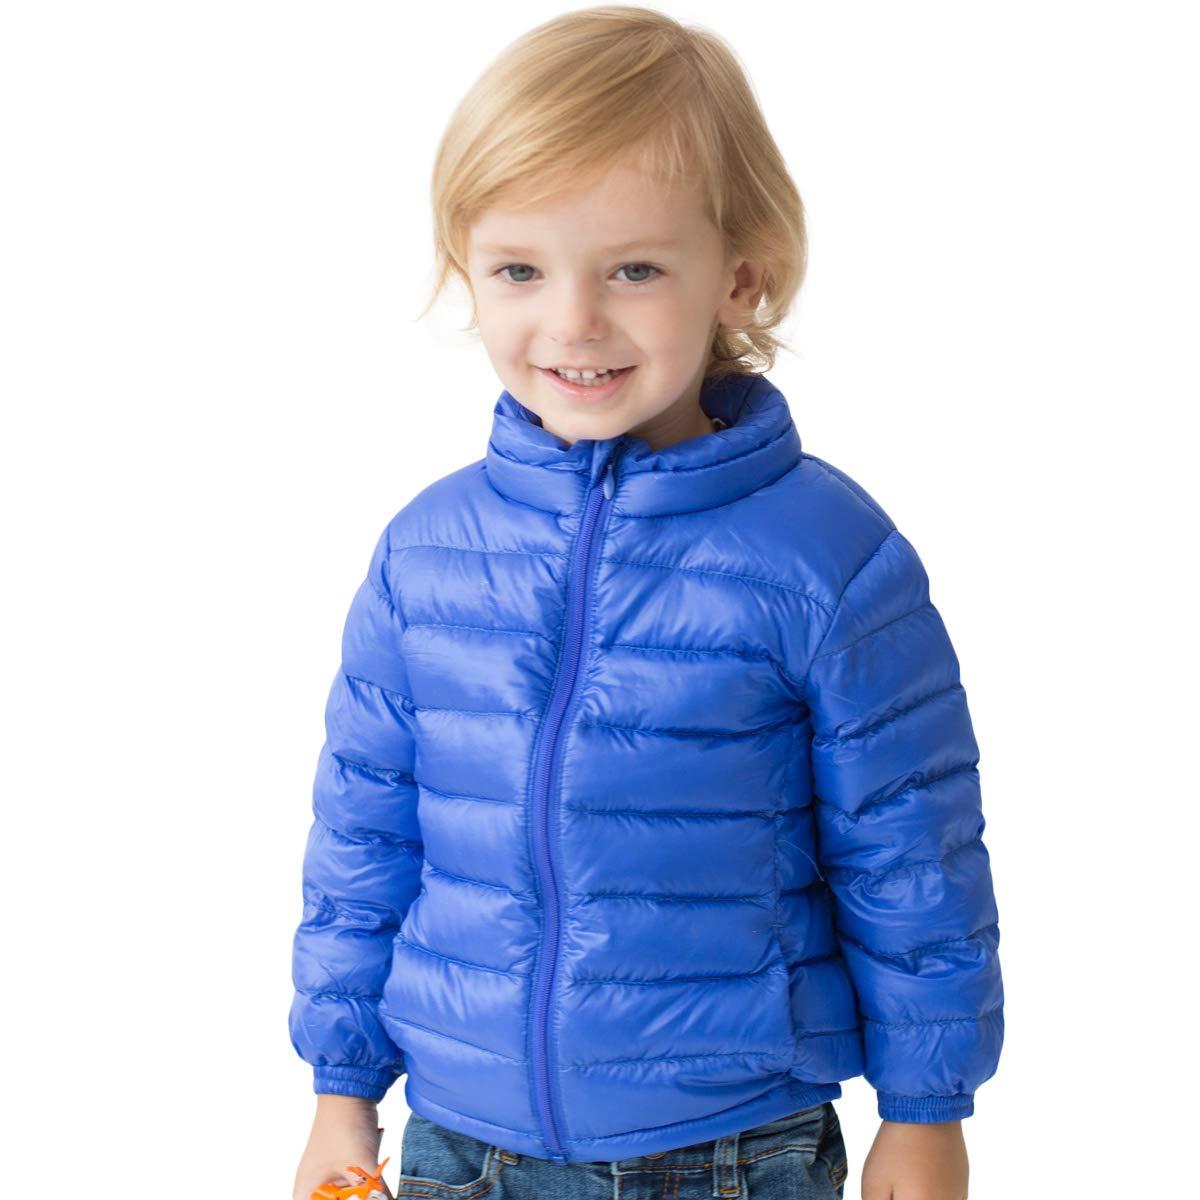 marc janie Little Girls Boys' Outerwear Ultra Light Weight Down Jacket 18 Months (73 cm) Jewelry Blue